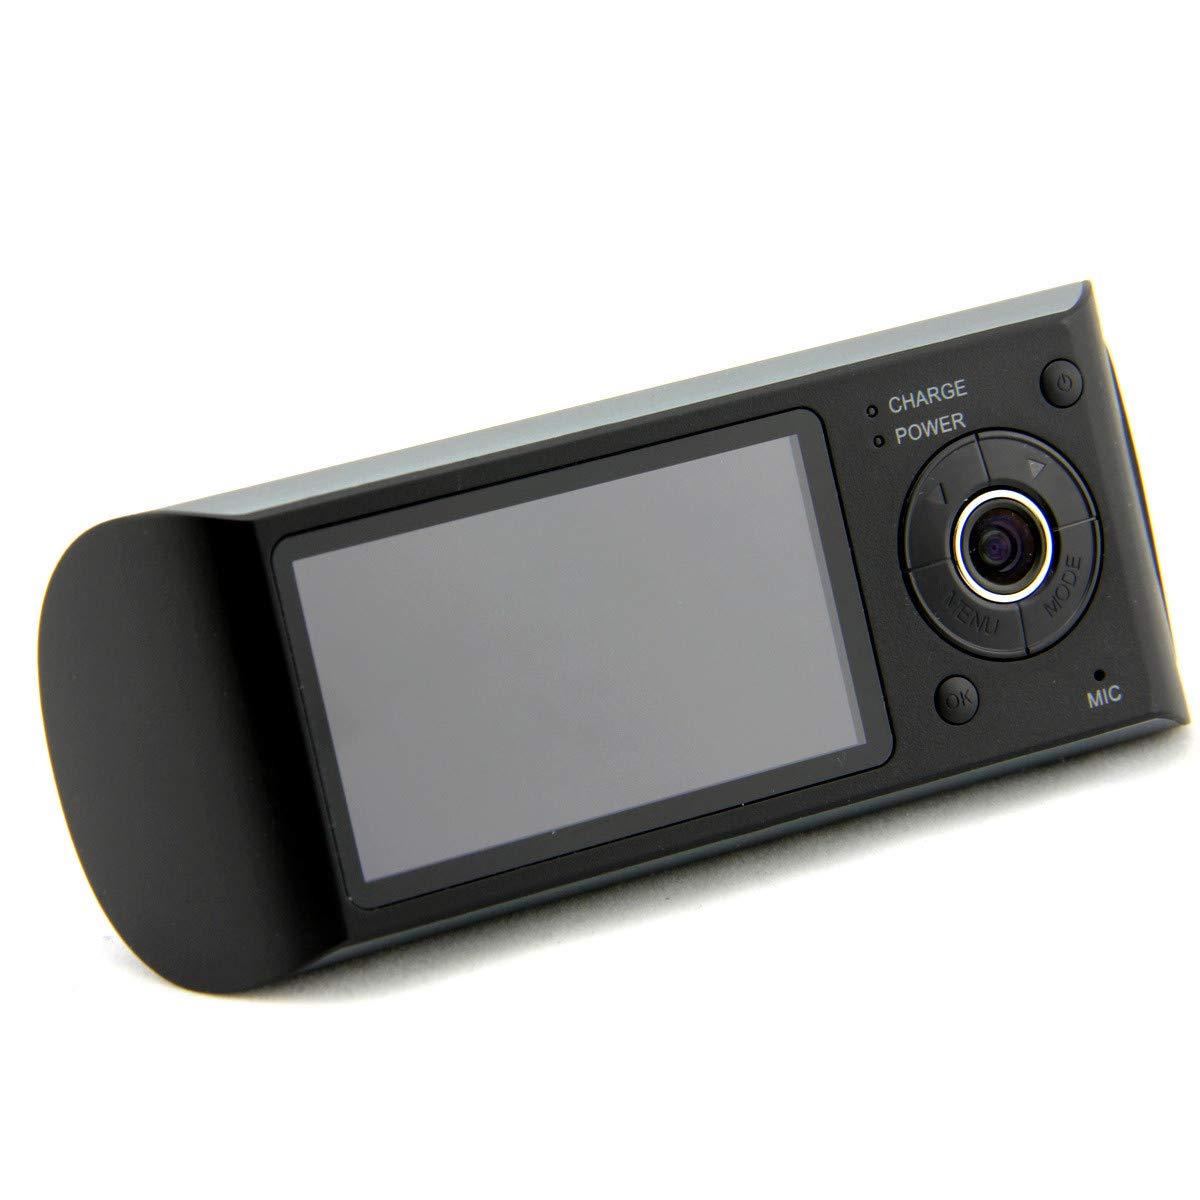 Car DVR Dual Camera Lens w/GPS Tracker - Driving Track, Speed, Time & Date 2.7'' Vehicle Video Recorder Dash Cam G-Sensor